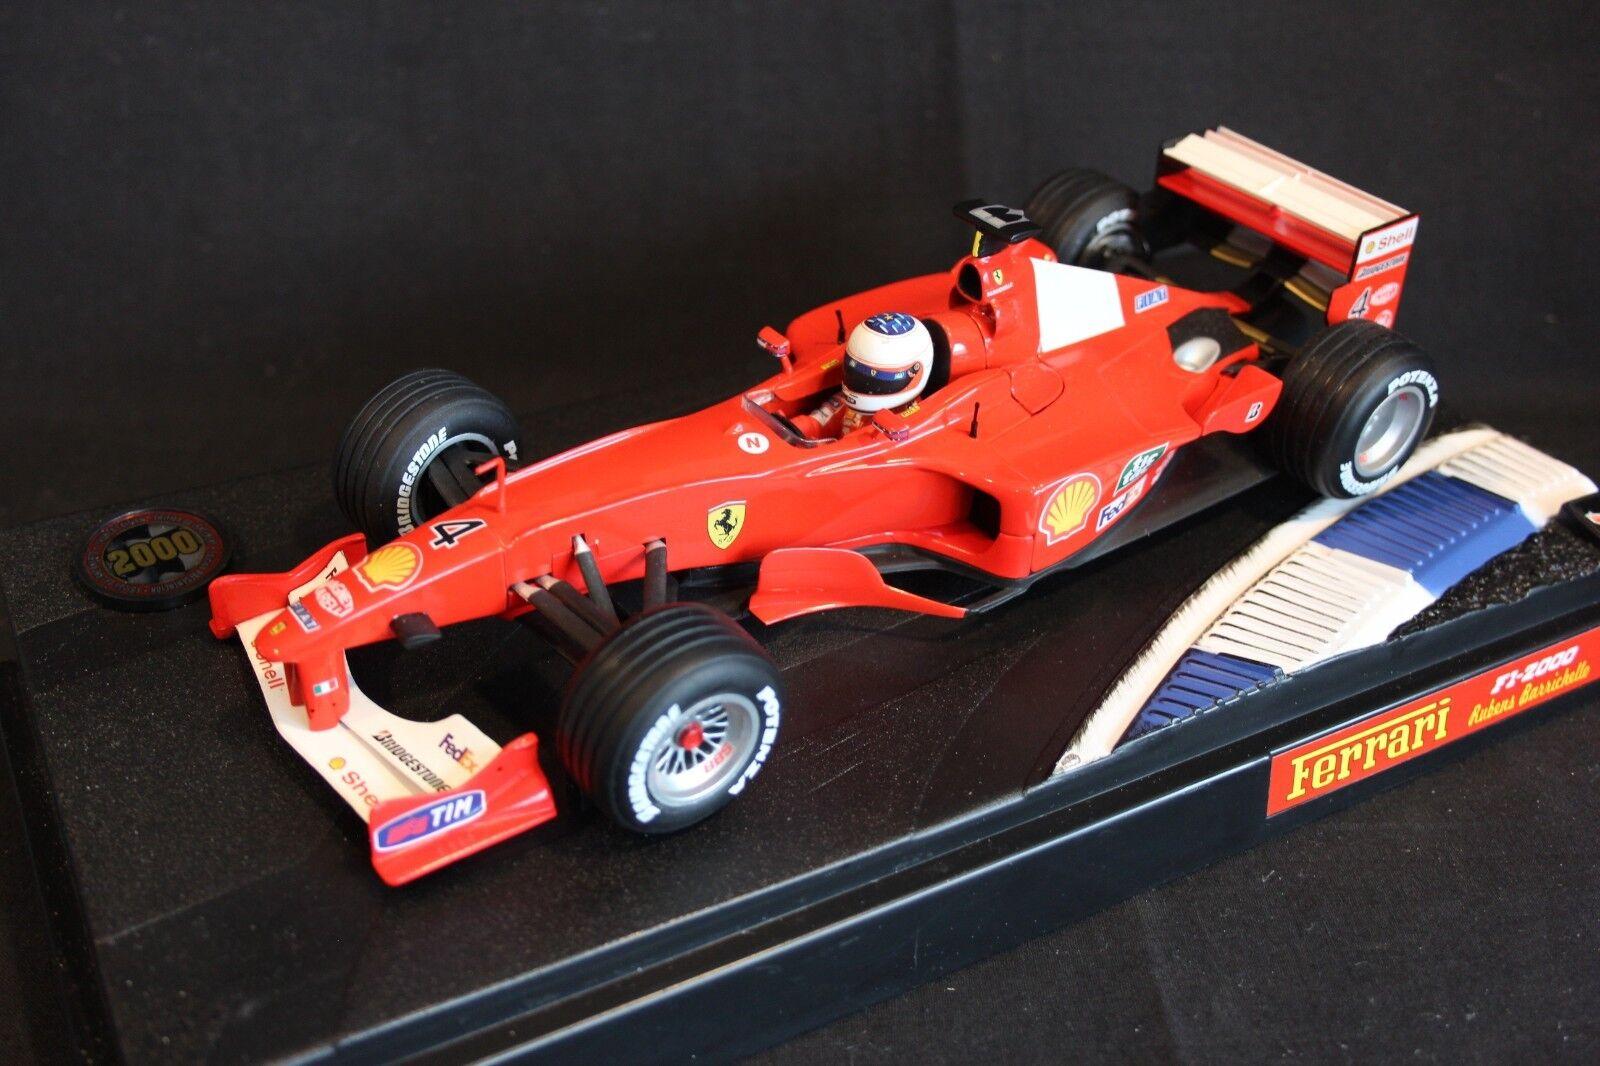 Hot Wheels Ferrari F1-2000 Launch Version 1 18  4 Rubens Barrichello (BRA)